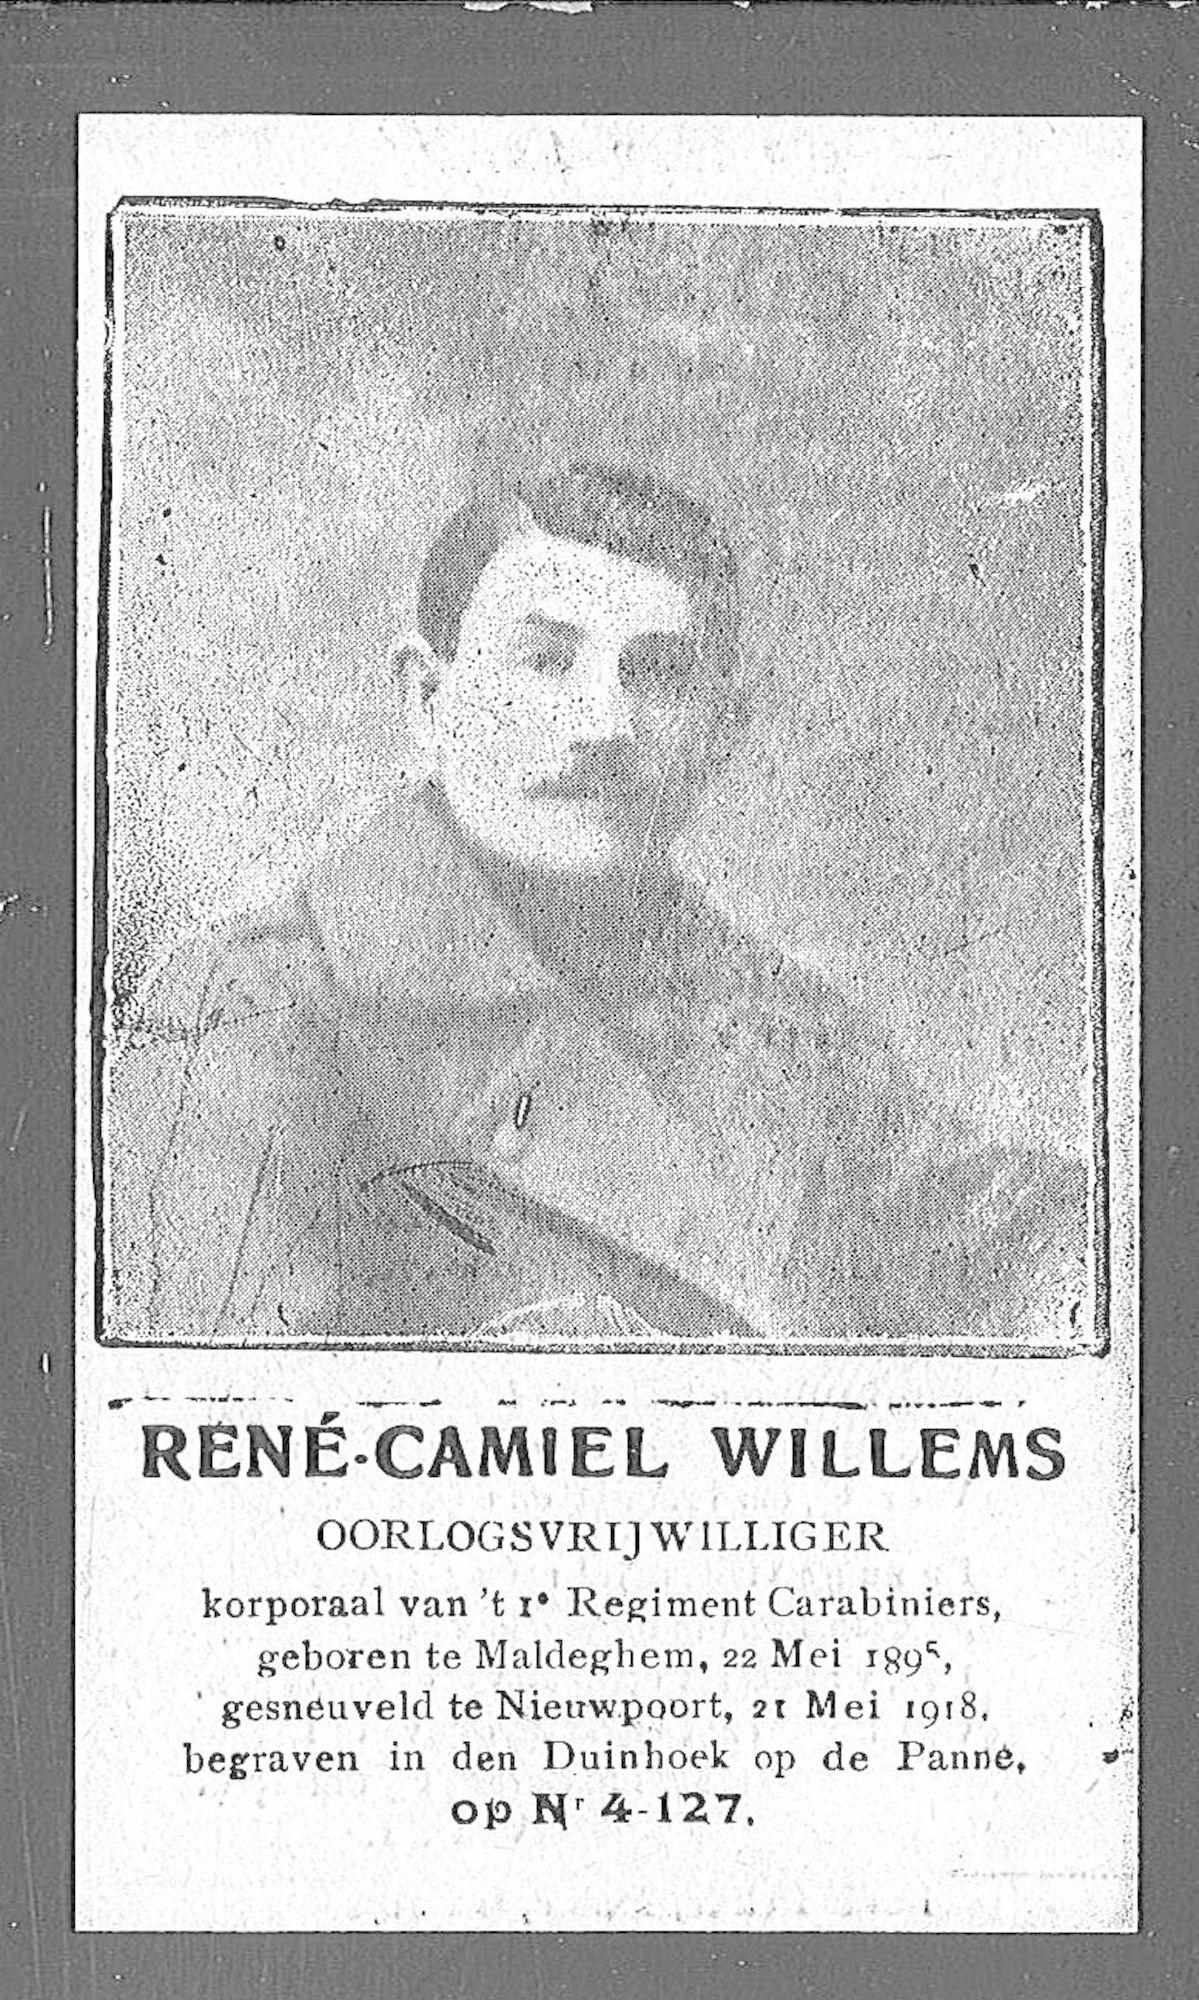 René-Camiel Willems